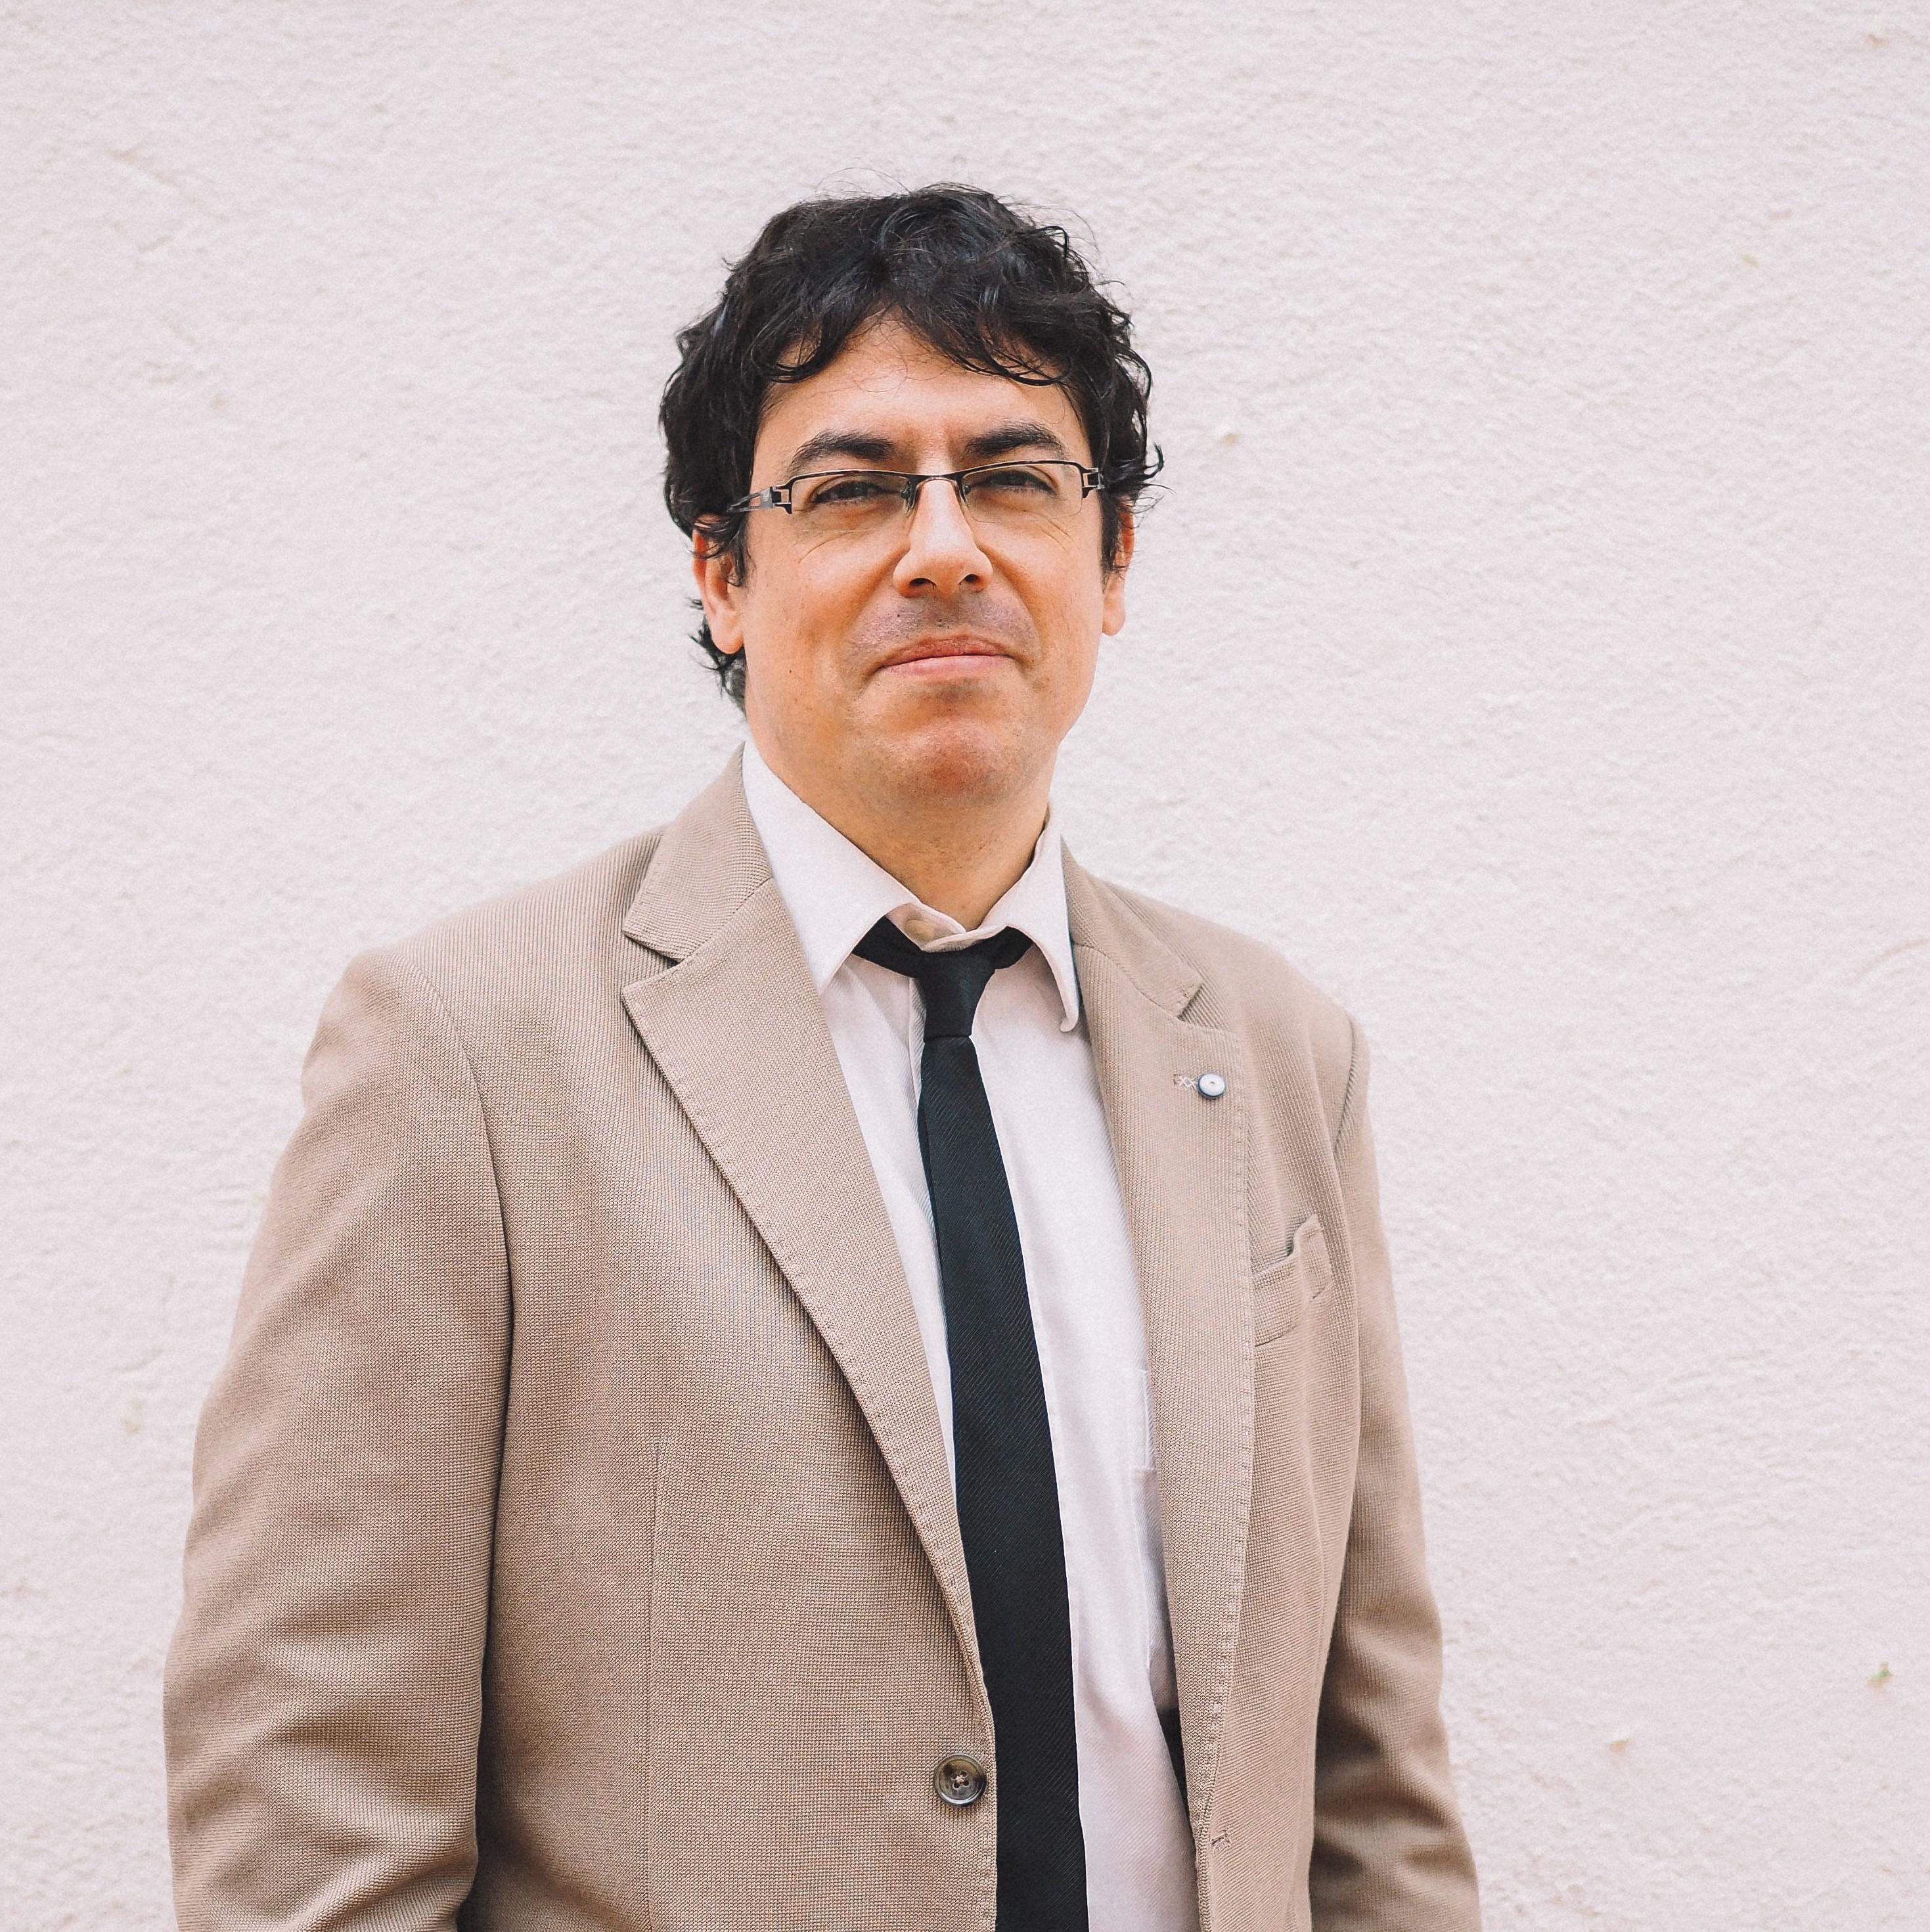 Ricardo Rey Rodriguez